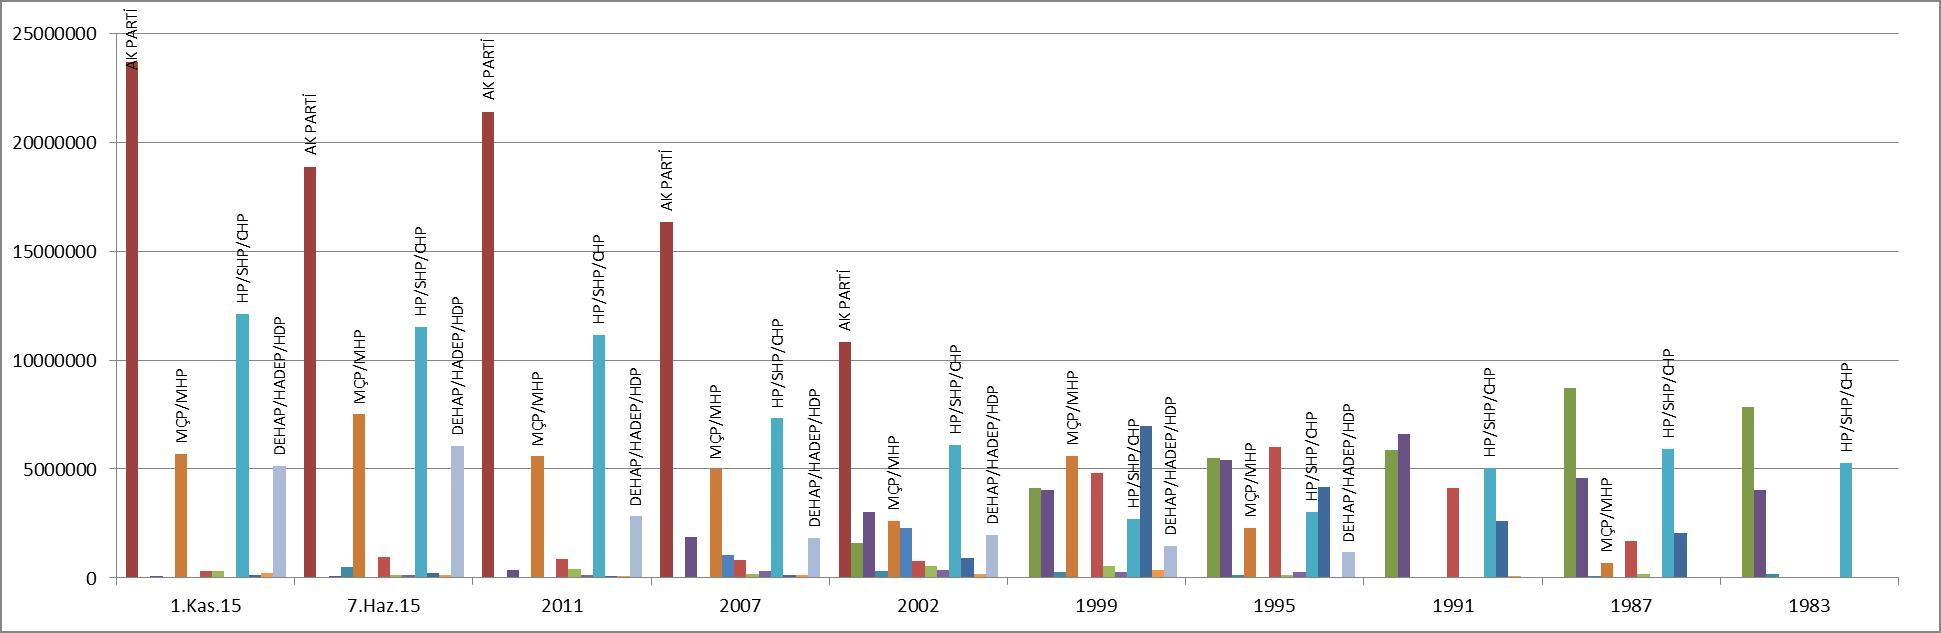 1983-2015-milletvekili-secim-sonuclari.jpg